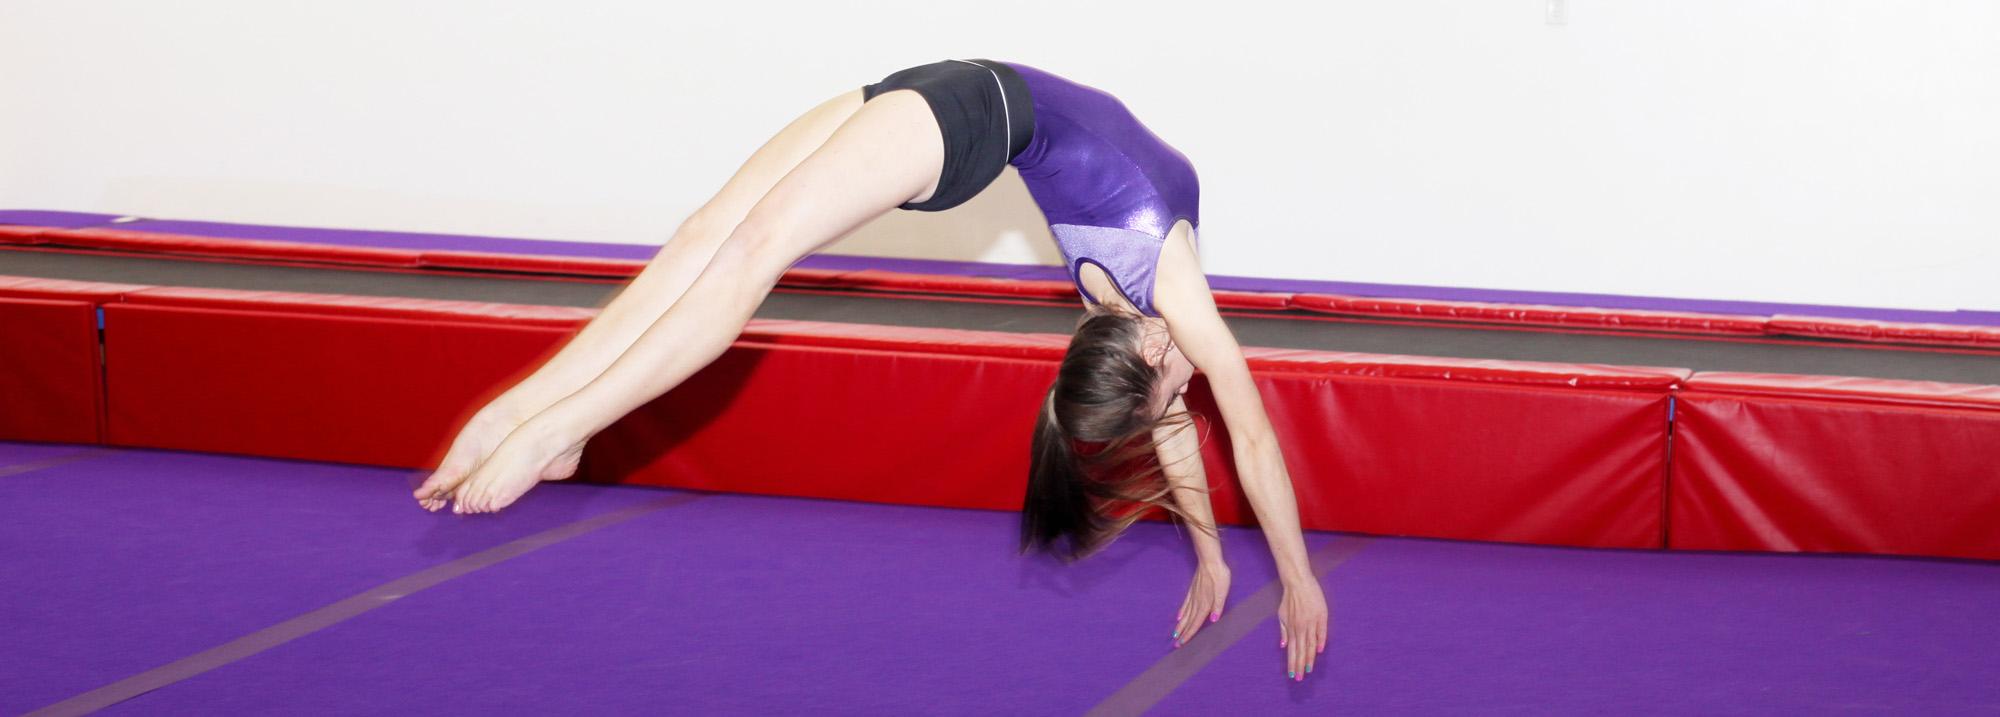 kelowna gymnastics boys girls school age programs